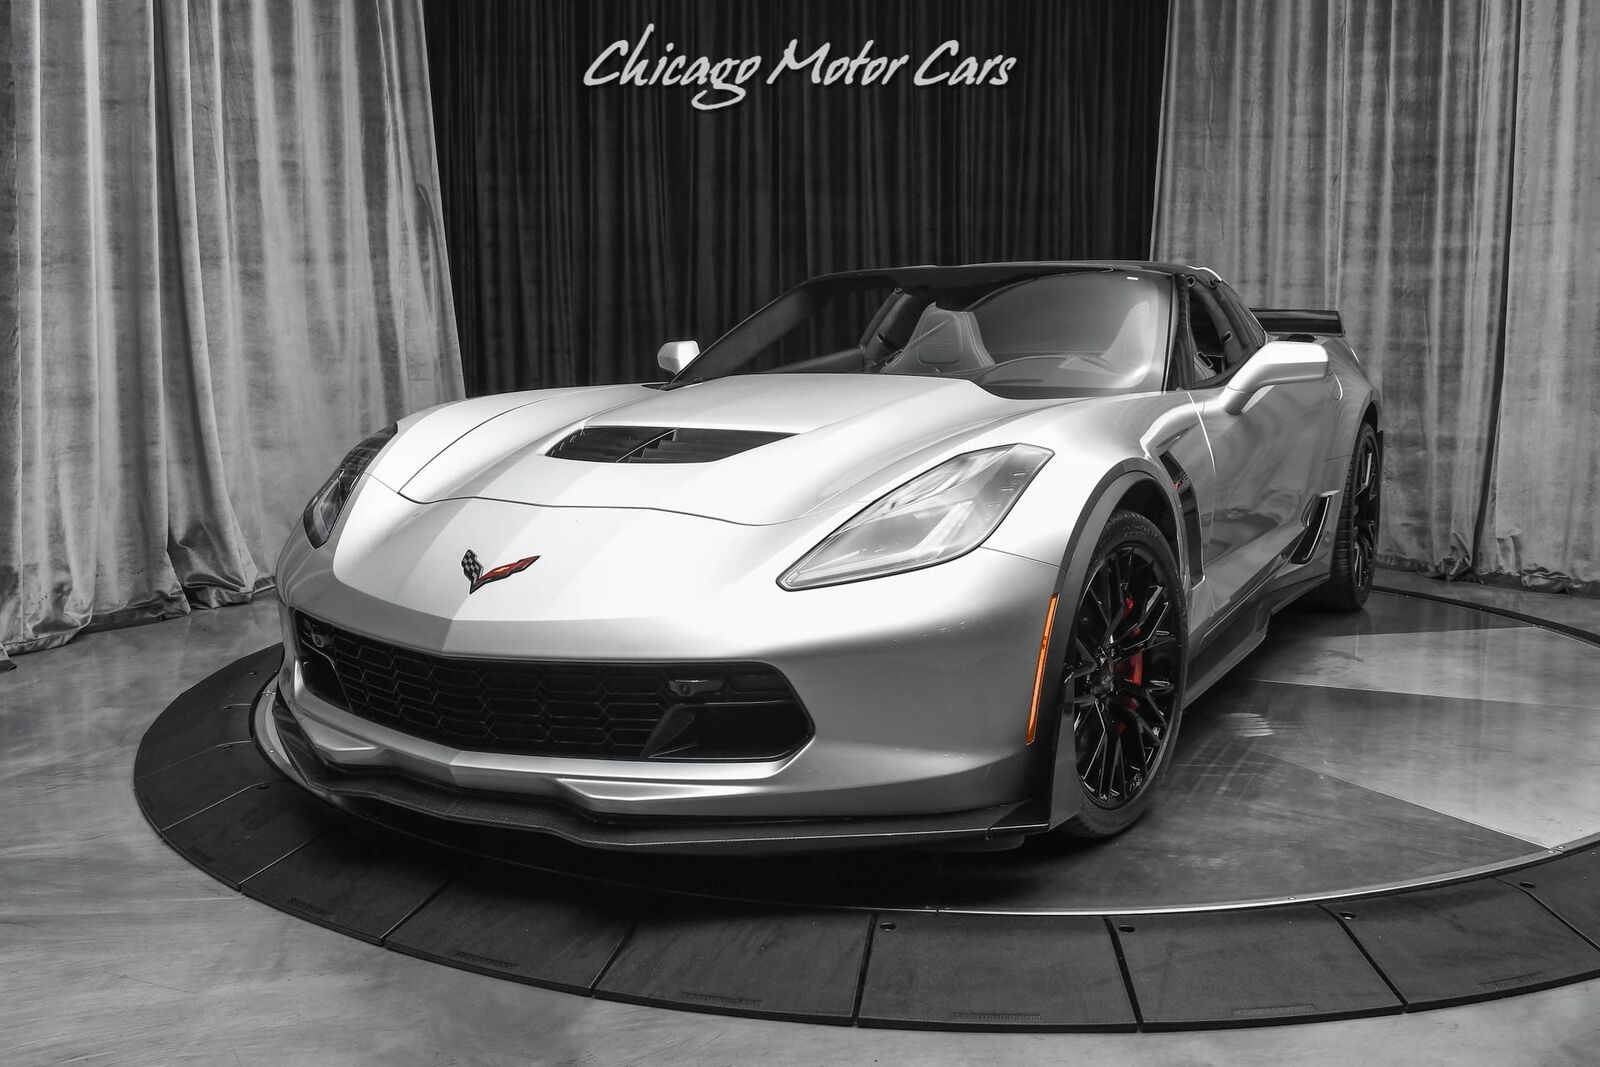 2016 Silver Chevrolet Corvette Z06 3LZ   C7 Corvette Photo 2